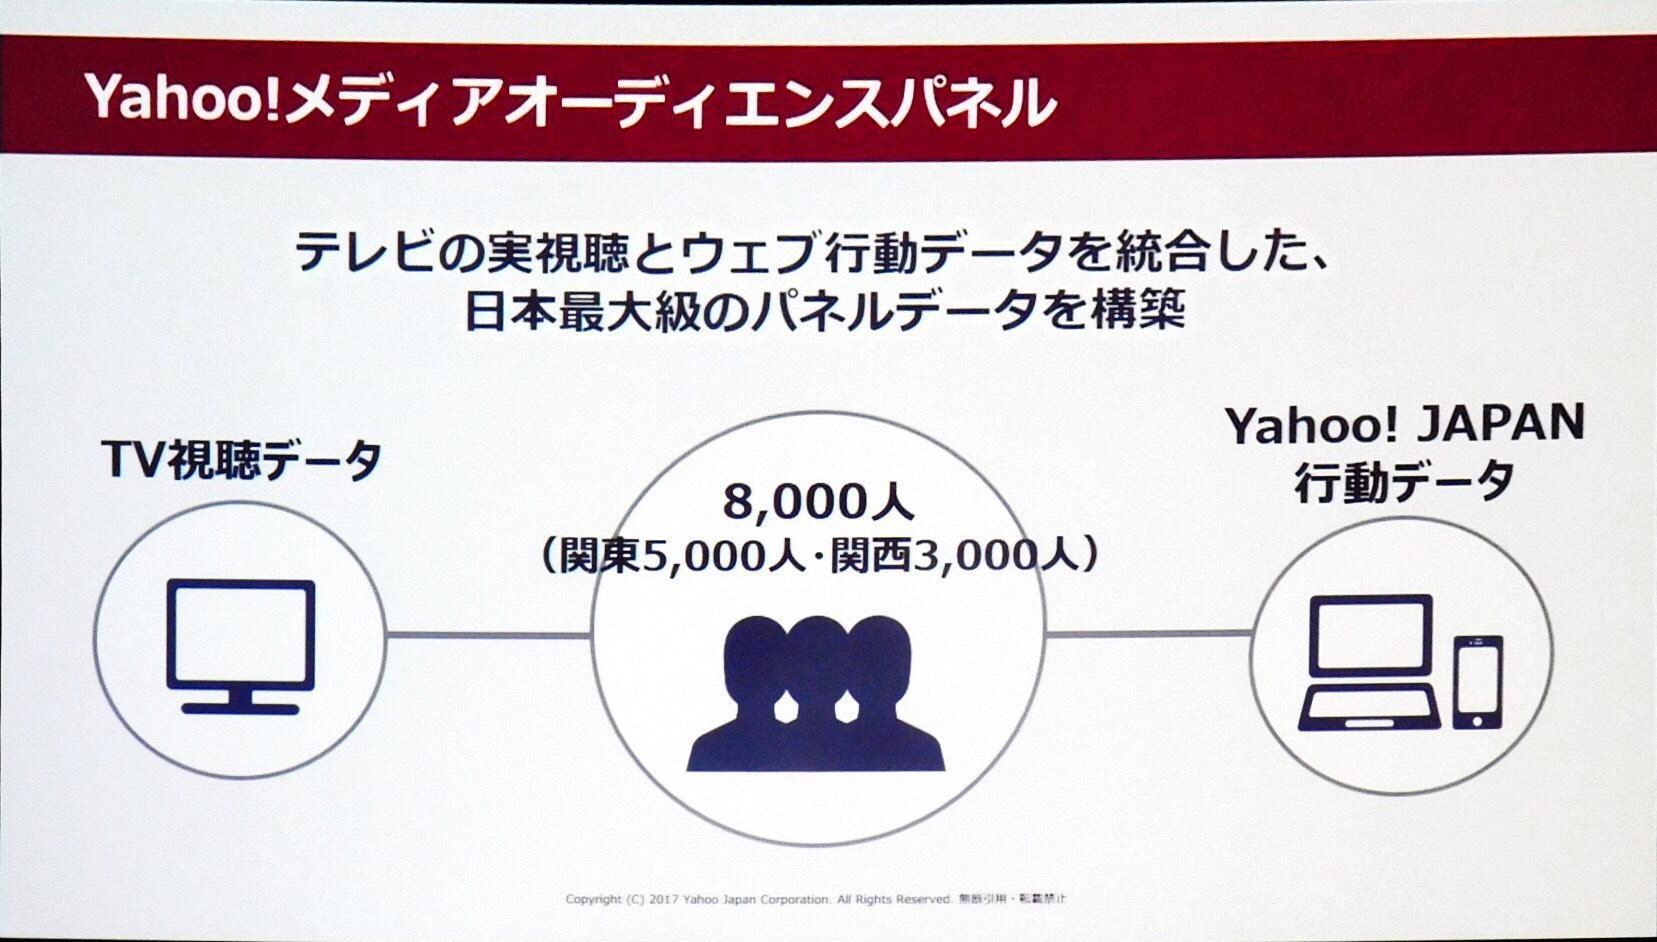 https://news.mynavi.jp/itsearch/2017/08/28/6610273163714.jpg